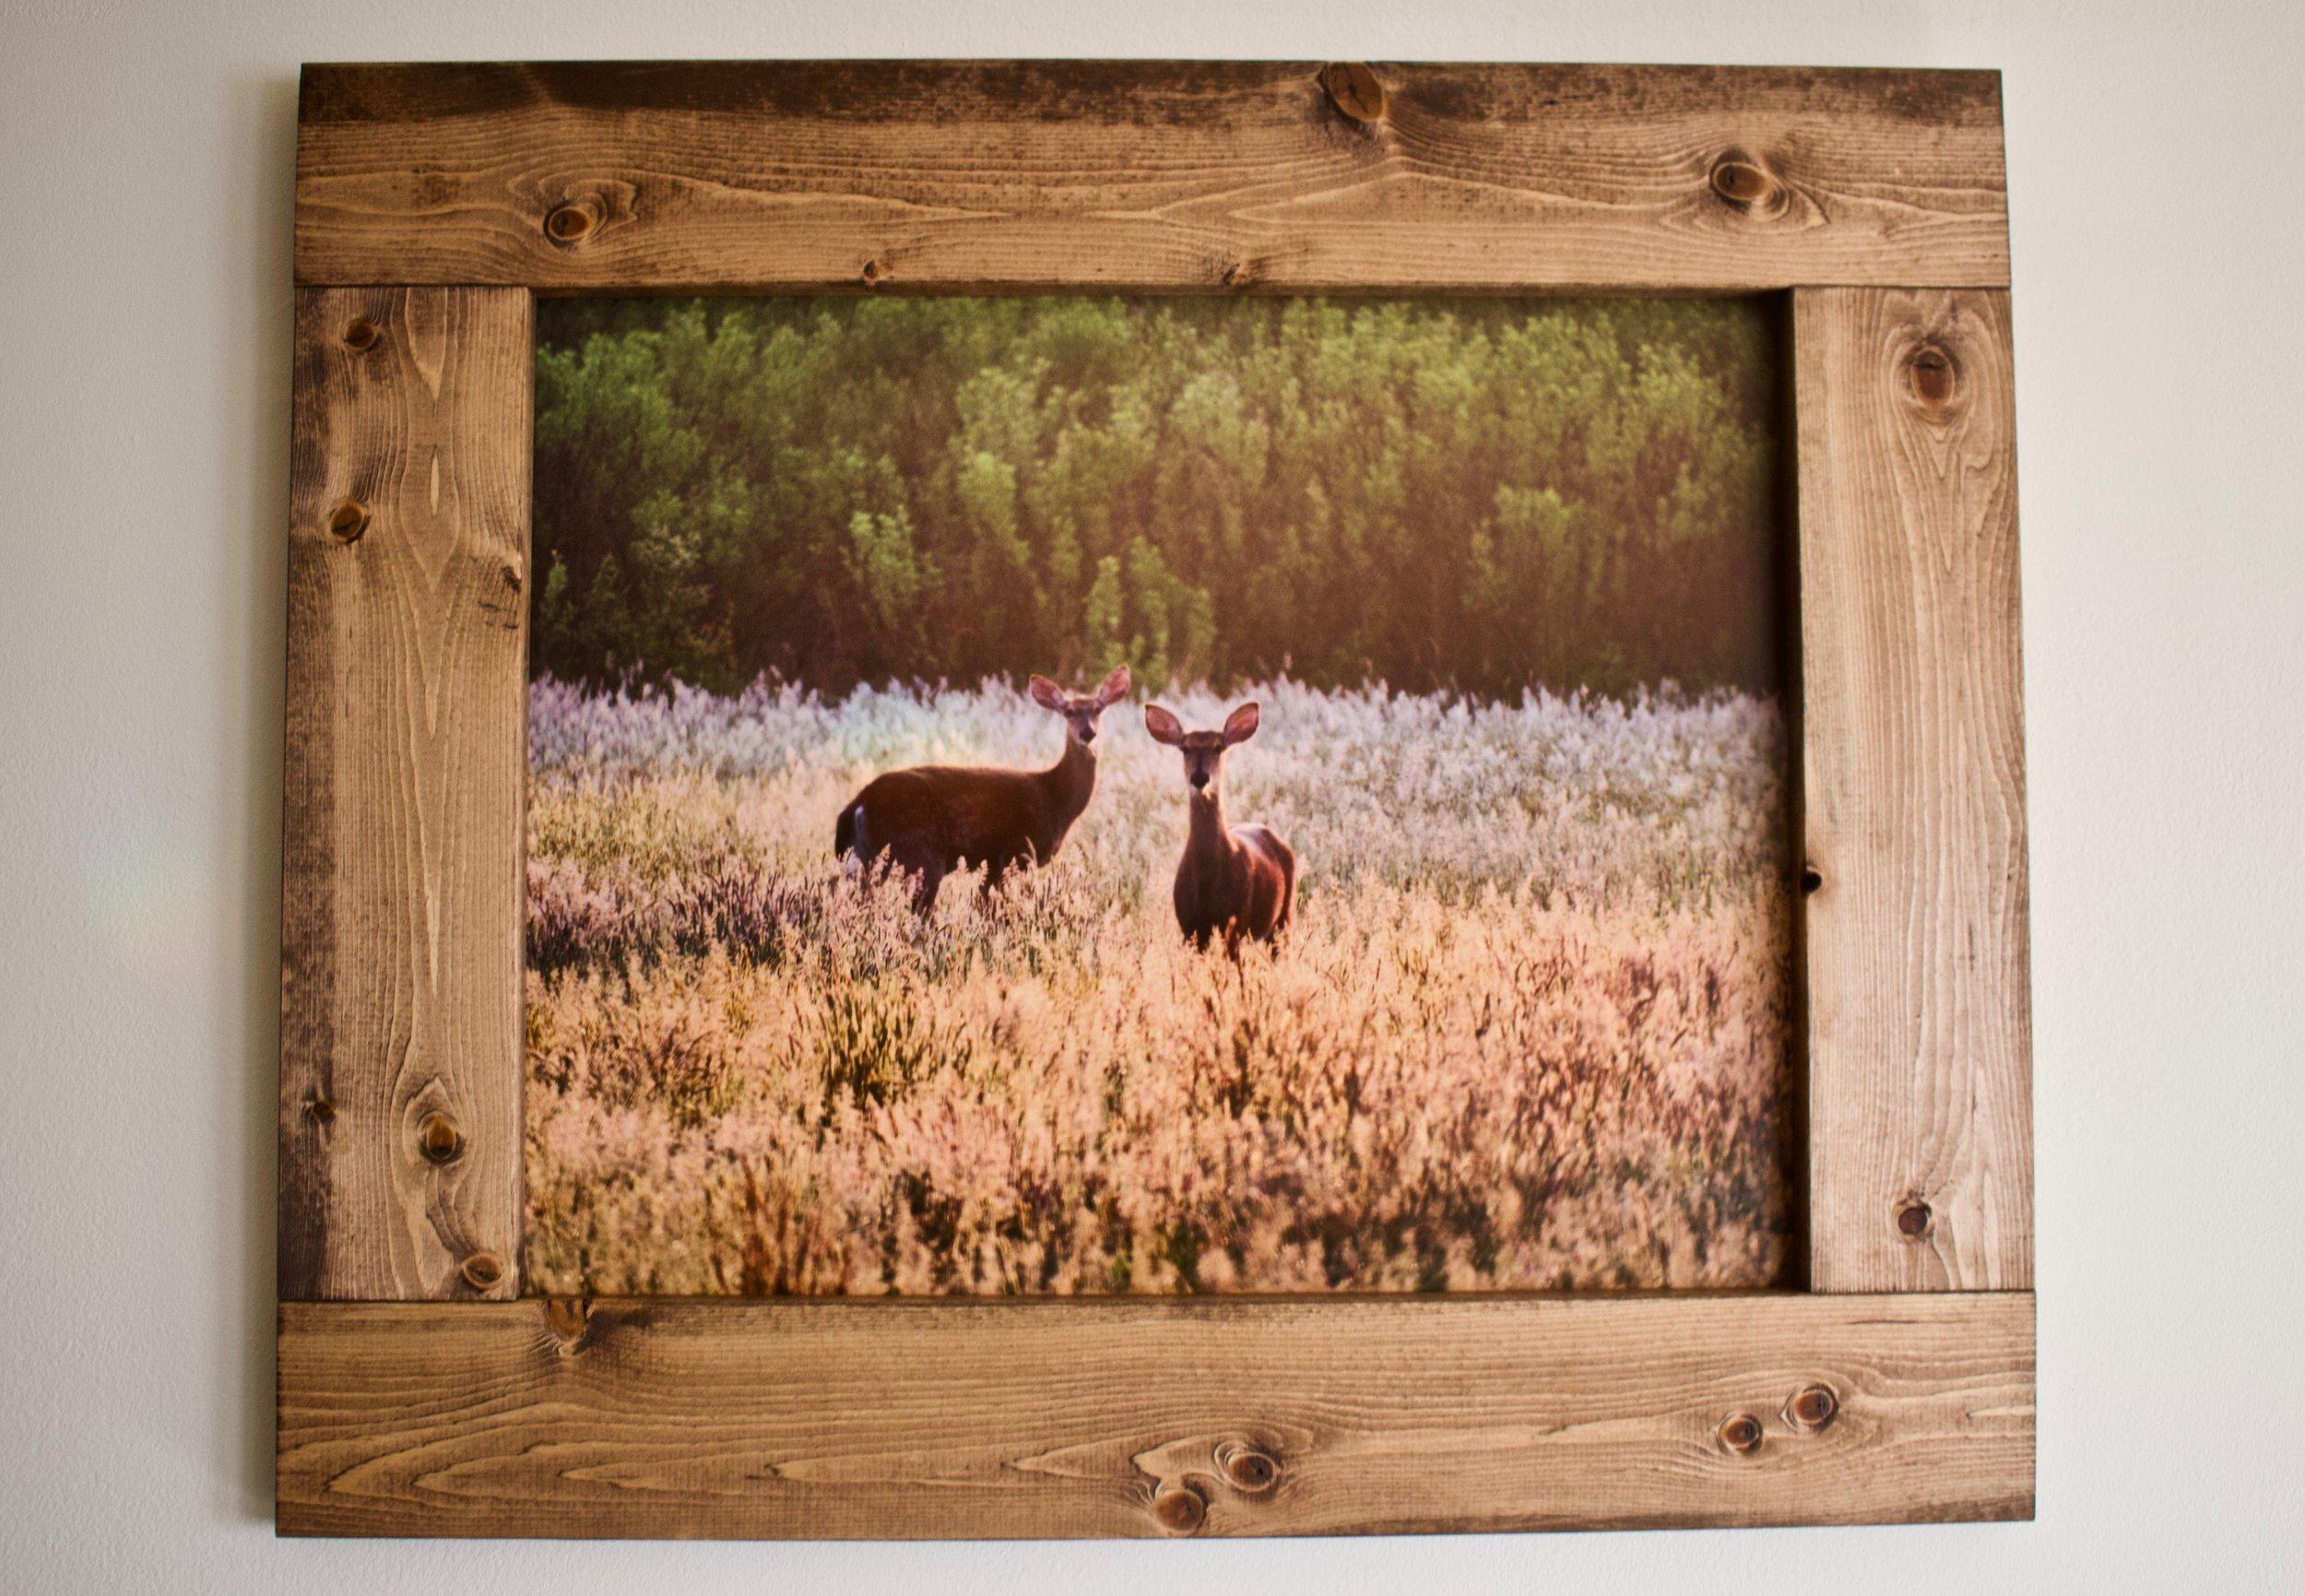 Deer @ Old Field 2 (October 2018)